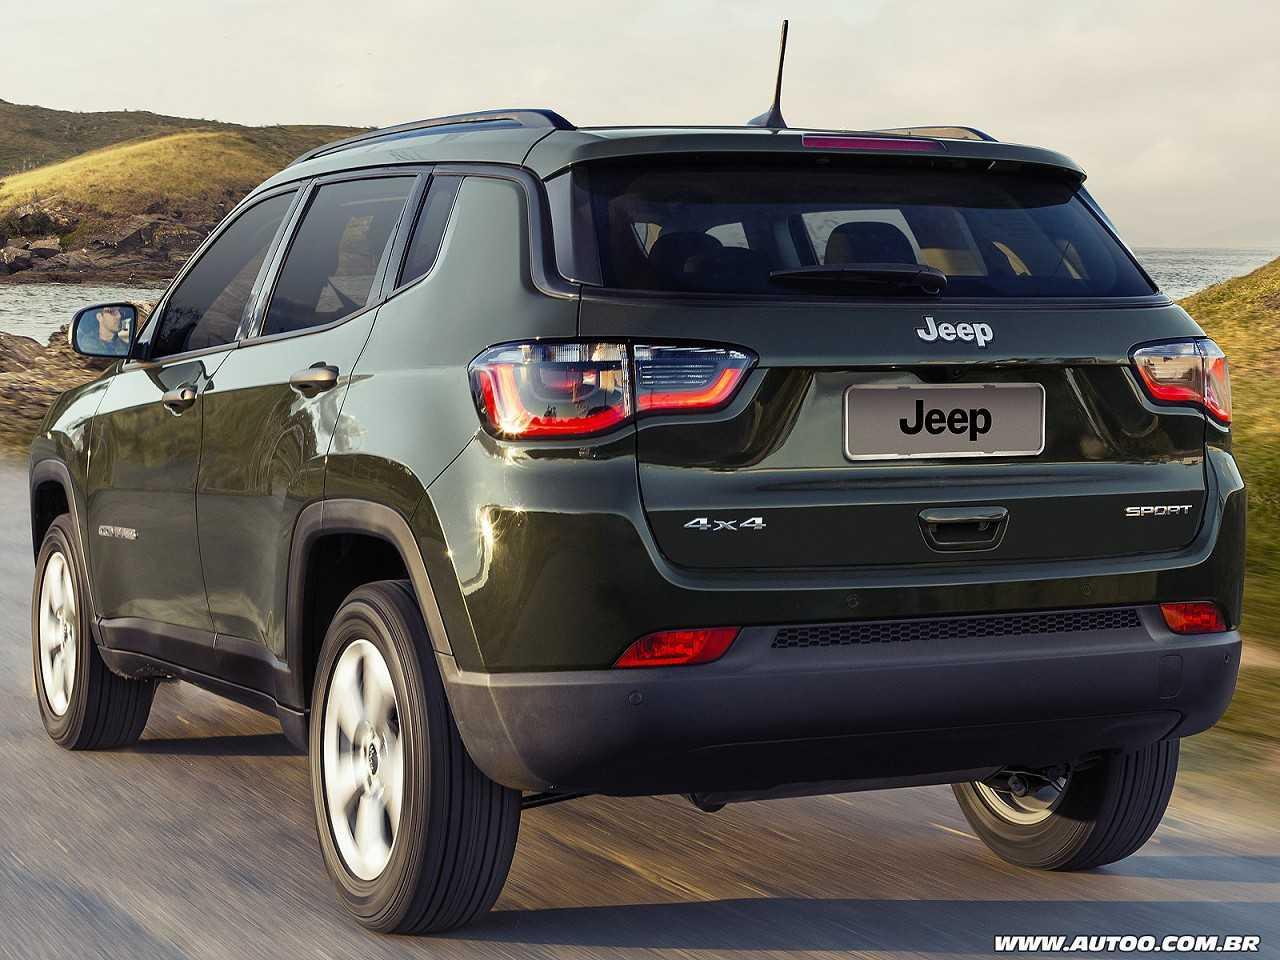 JeepCompass 2018 - ângulo traseiro